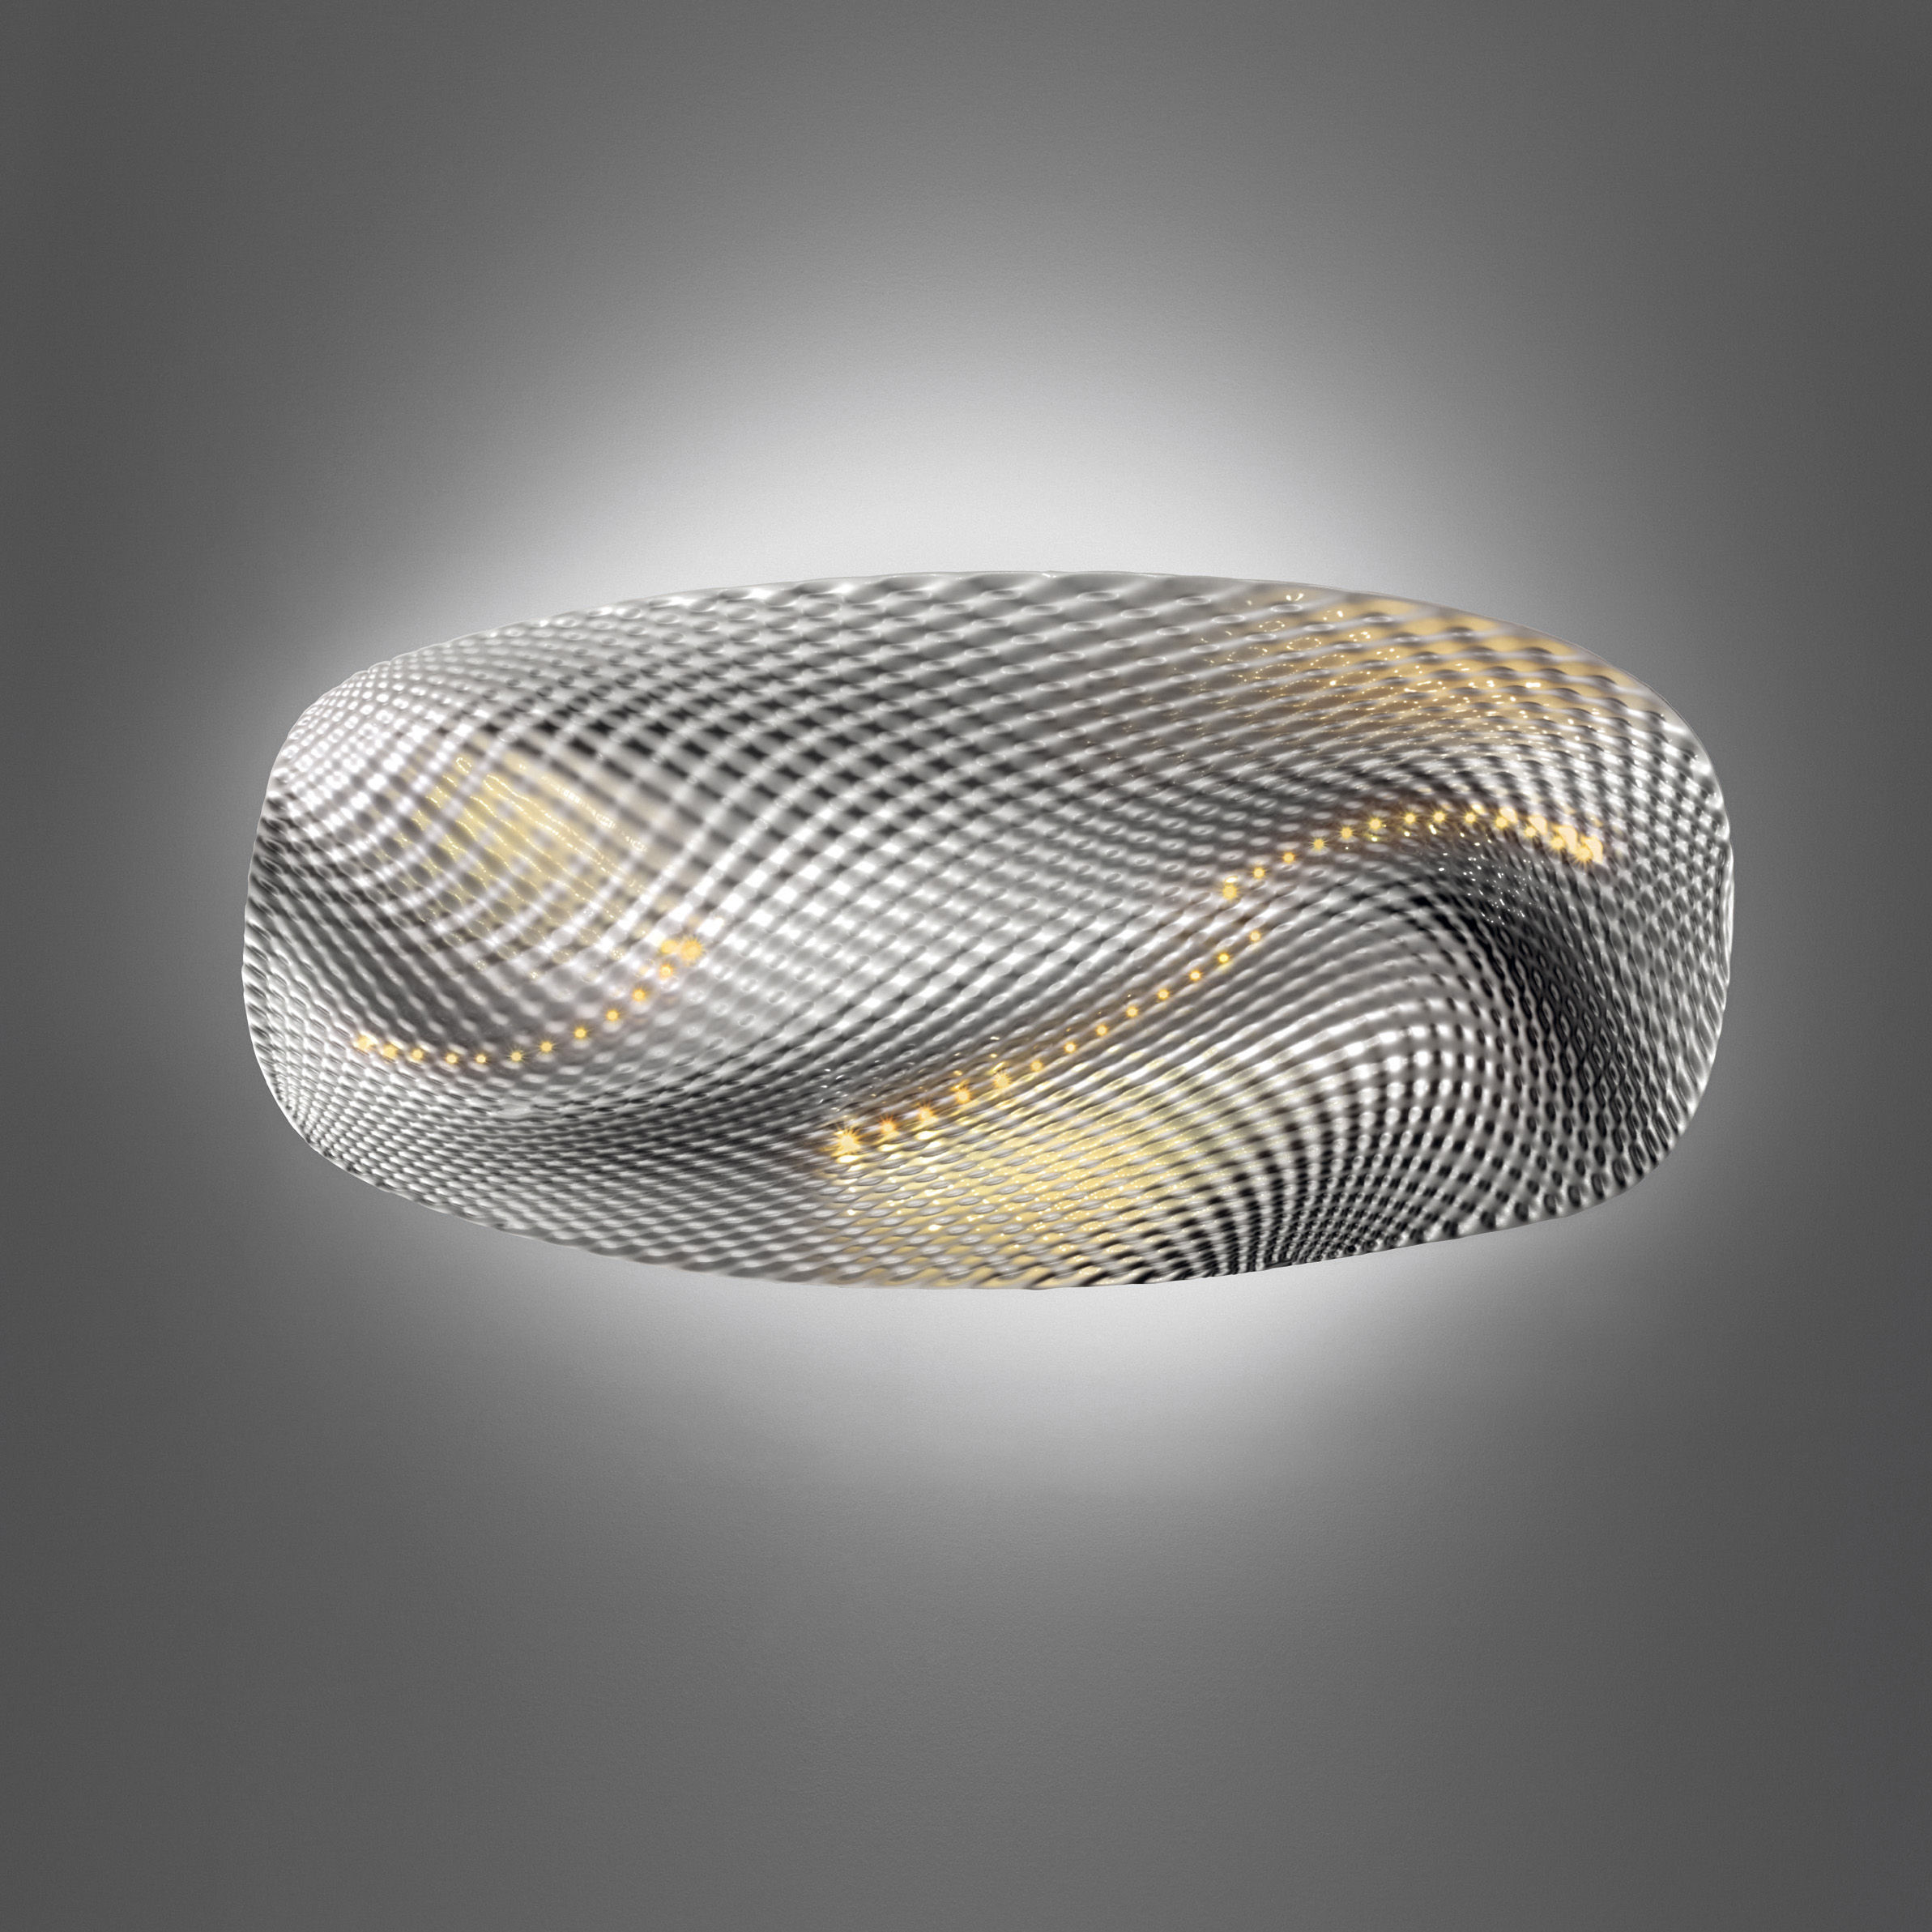 applique cosmic angel led plafonnier gris alu chrome artemide. Black Bedroom Furniture Sets. Home Design Ideas